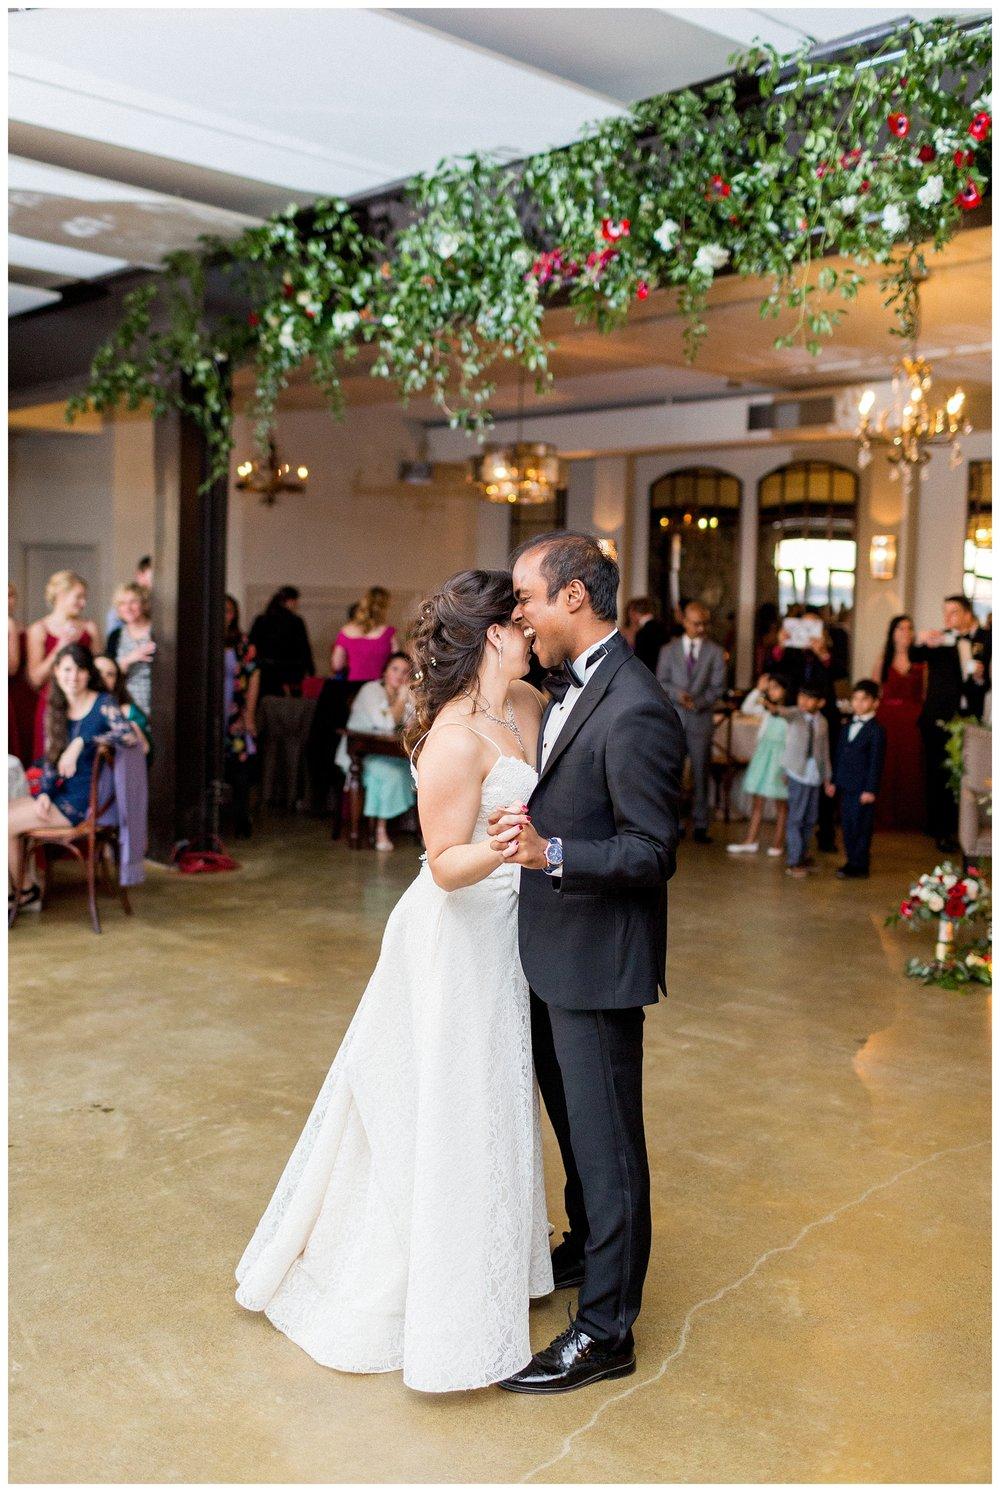 Stone Tower Winery Wedding | Virginia Winter Wedding | VA Wedding Photographer Kir Tuben_0096.jpg